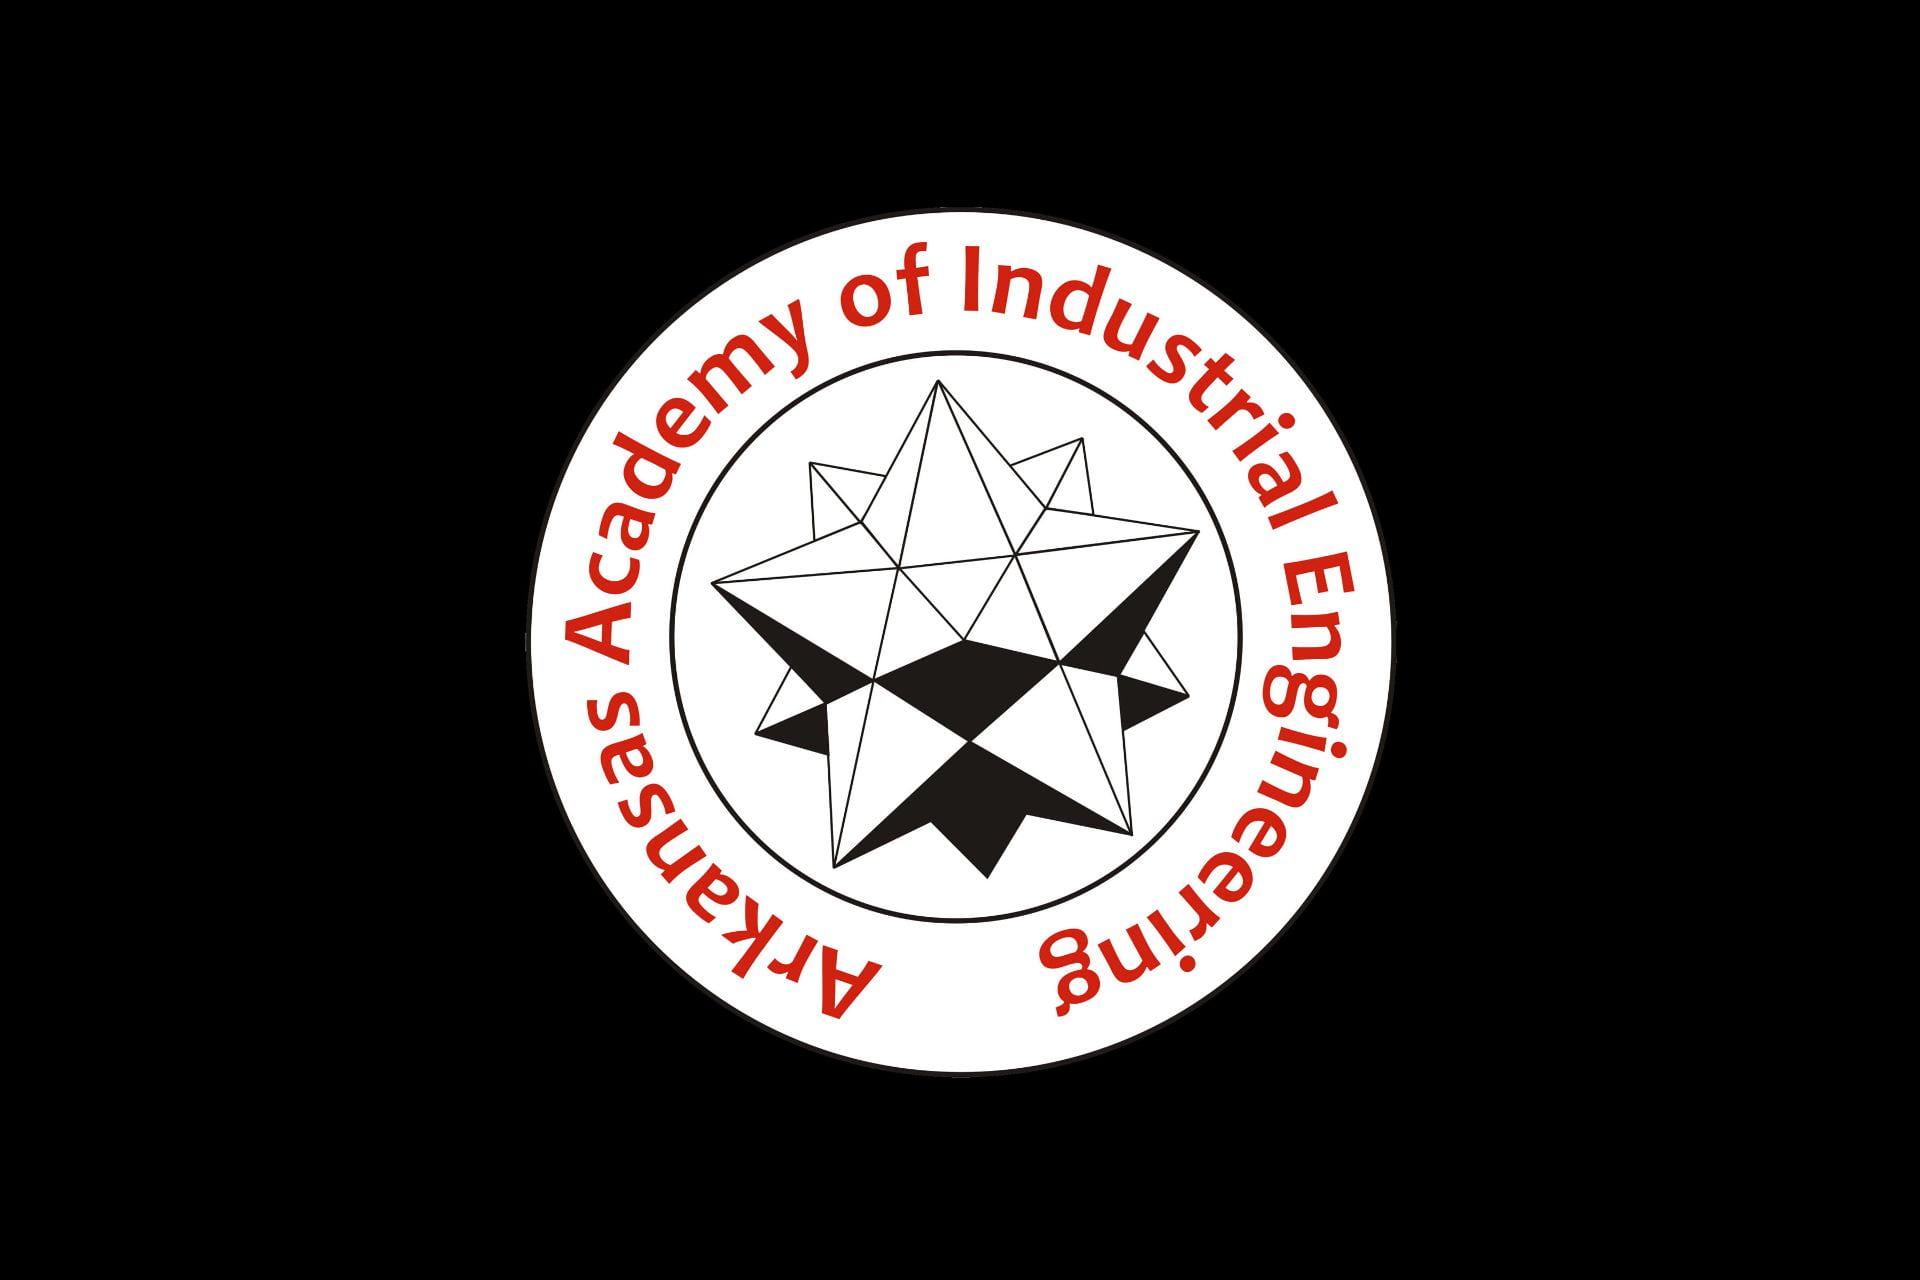 Arkansas Academy of Industrial Engineering